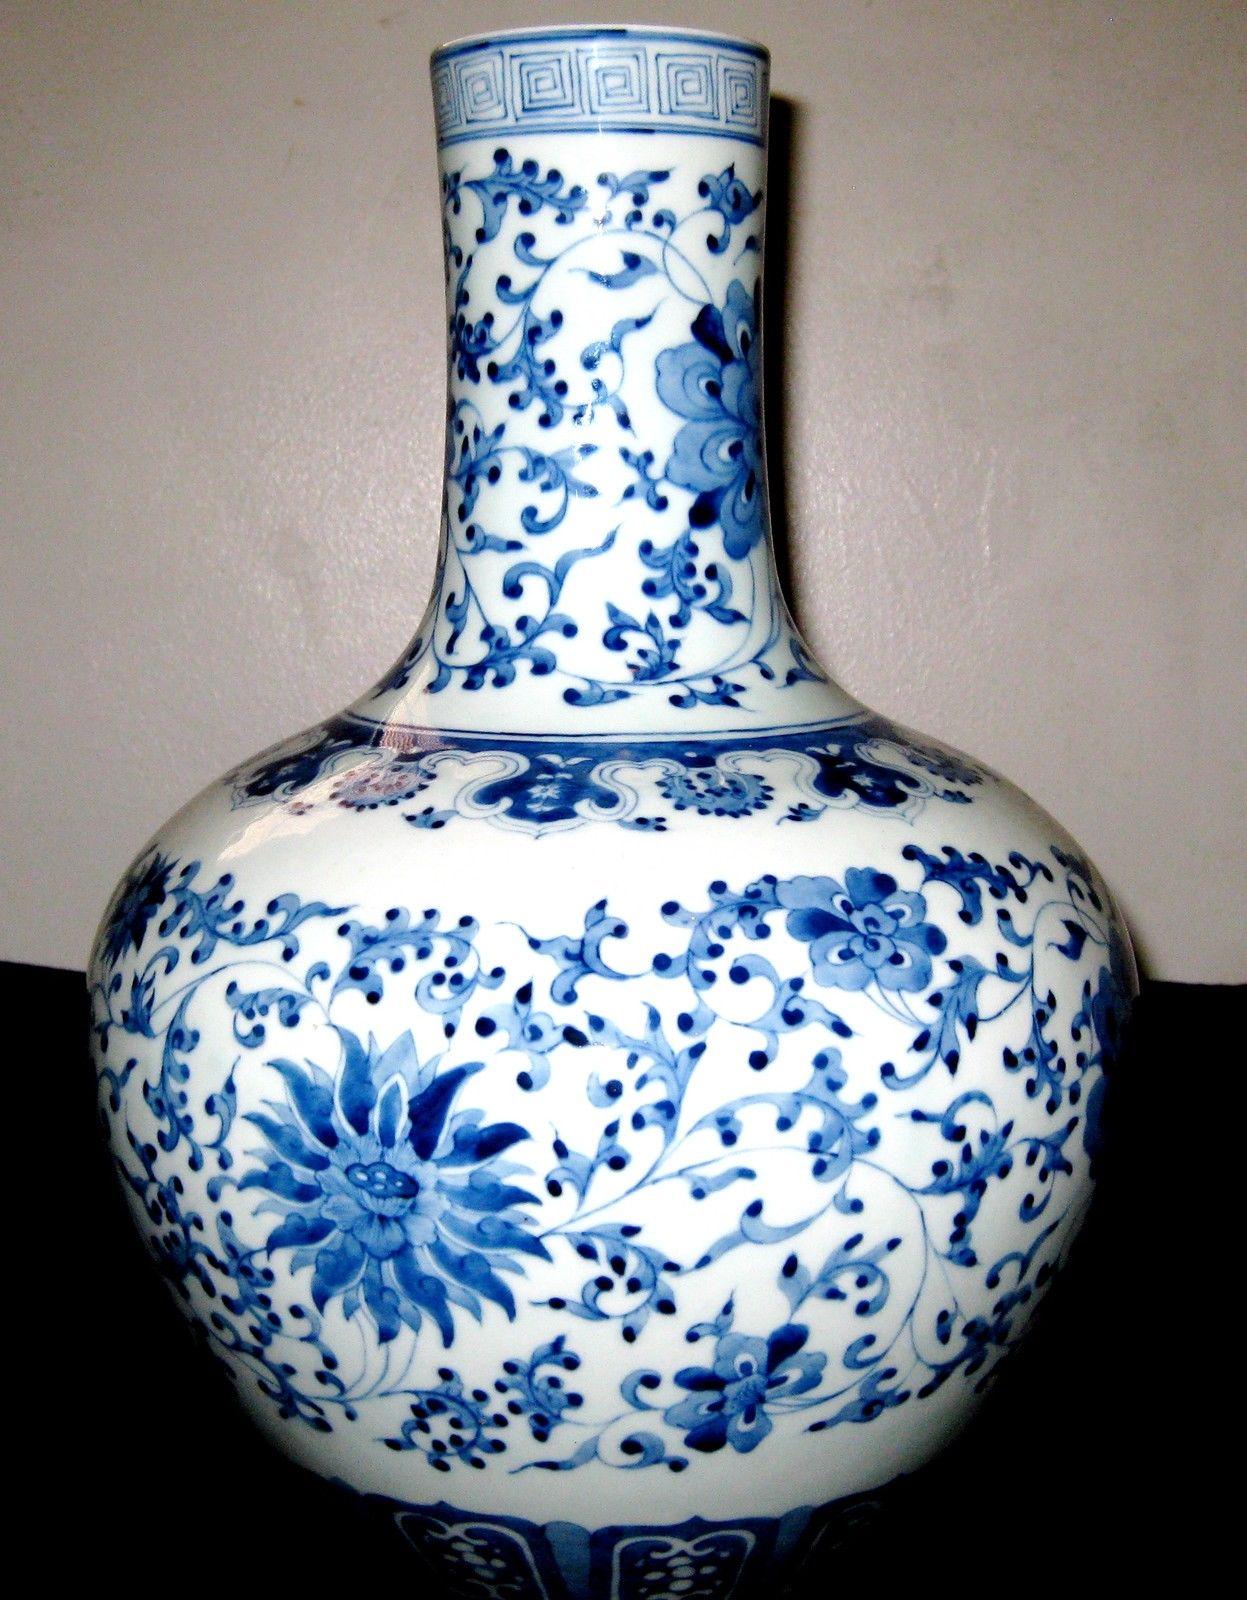 Antique chinese blue white 7 immortals porcelain vase dao quang antique chinese porcelain blue white vase qianlong mark reviewsmspy